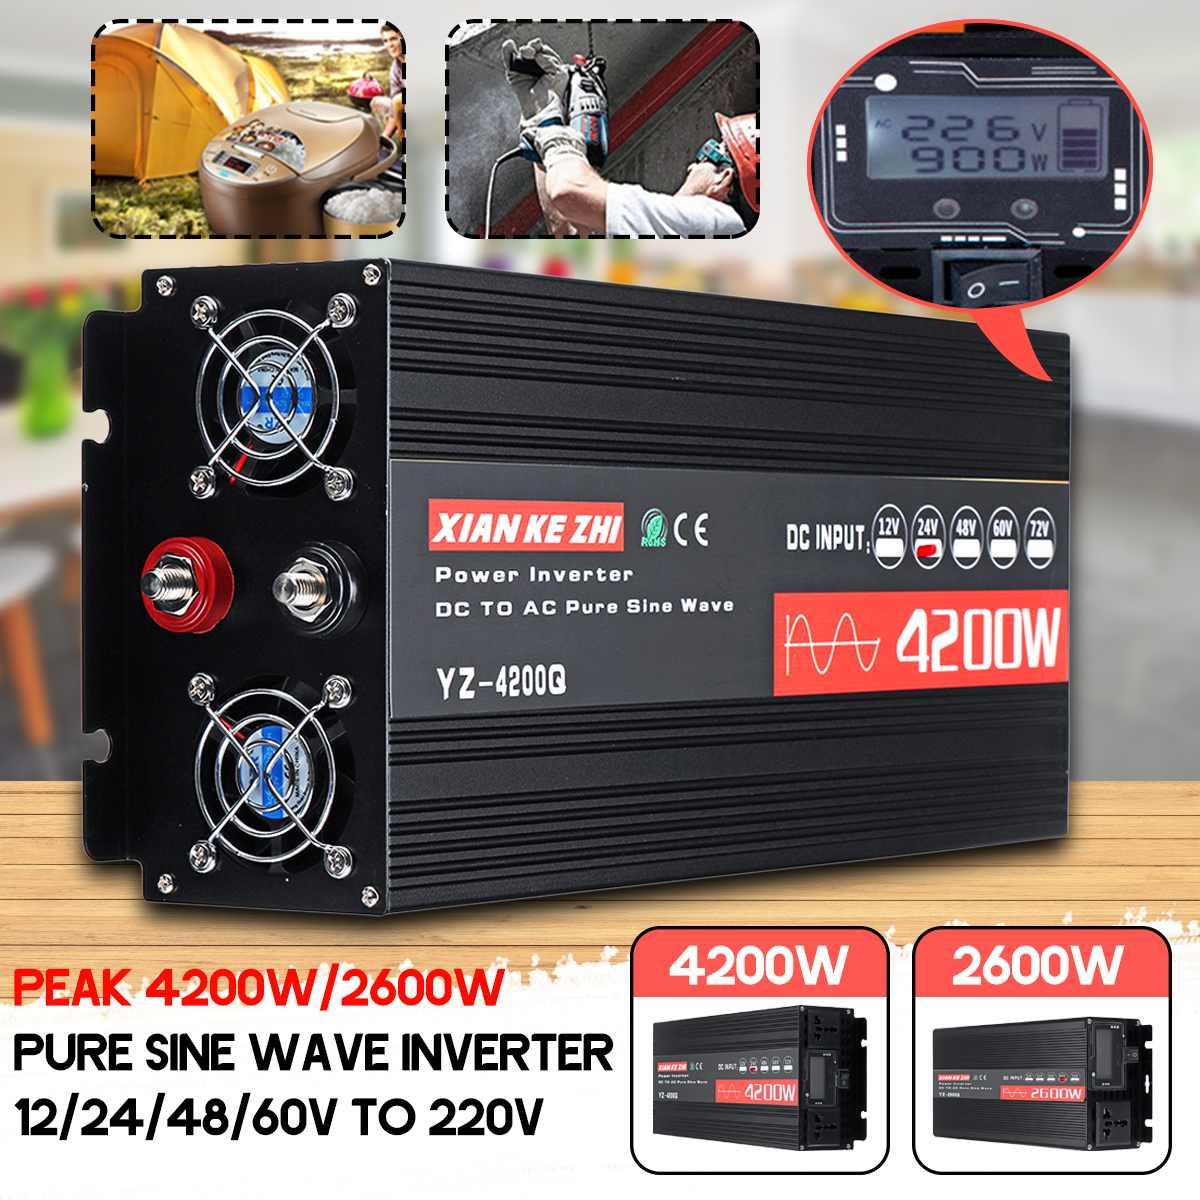 Inwerter 12 V/24 V/48/60 V 220V 2600/4200W transformator napięcia czysta fala sinusoidalna przetwornica napięcia DC12V na AC 220V konwerter + wyświetlacz LED